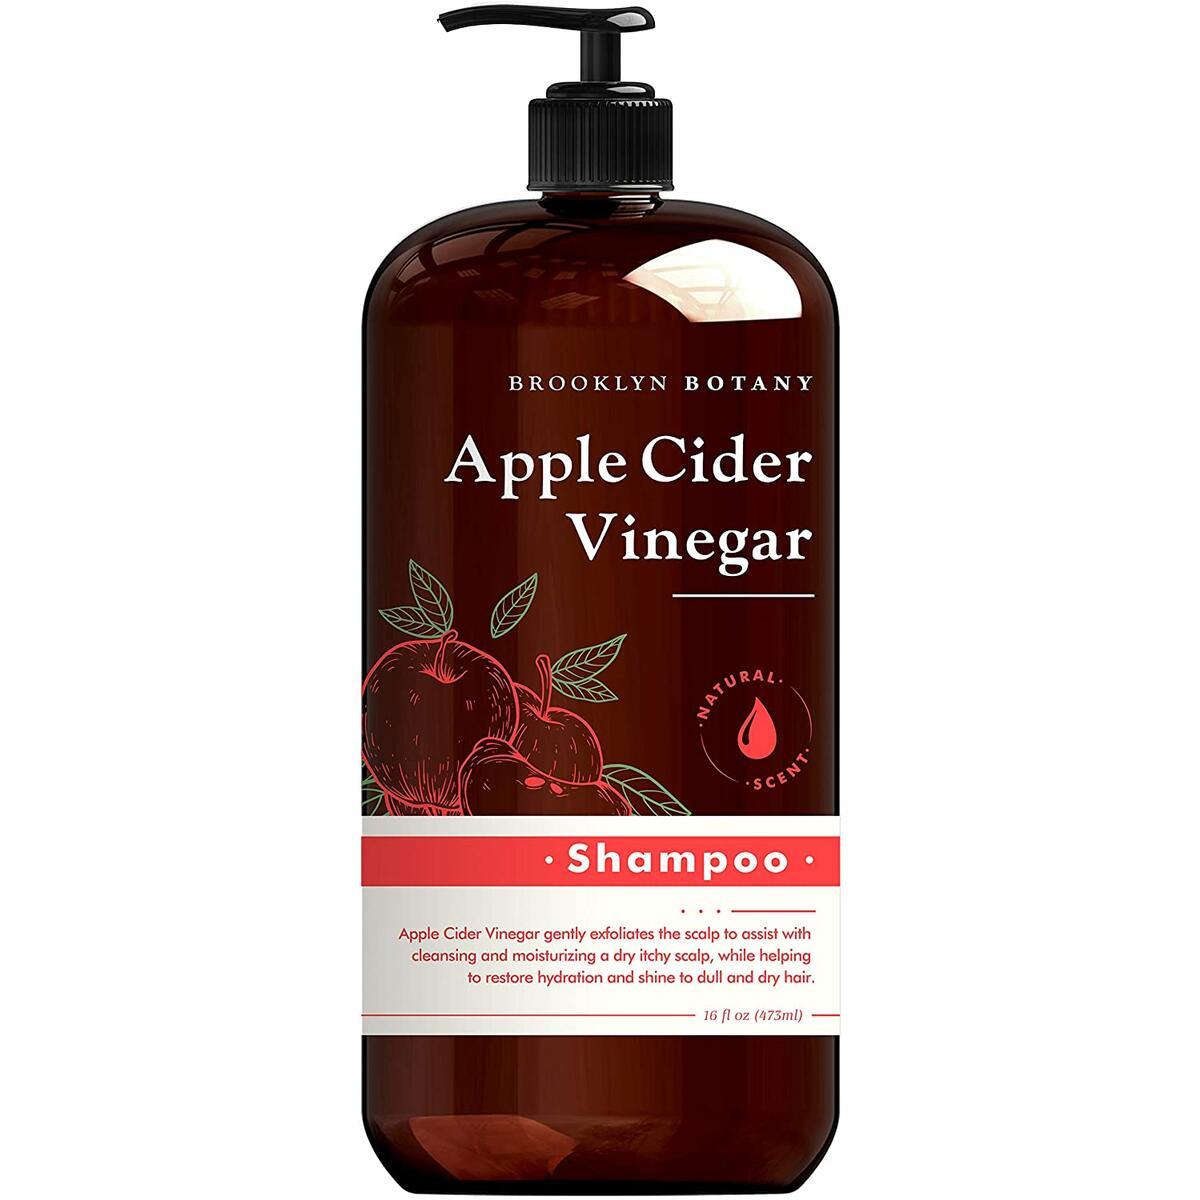 Apple Cider Vinegar and Coconut Avocado shampoo conditioner set